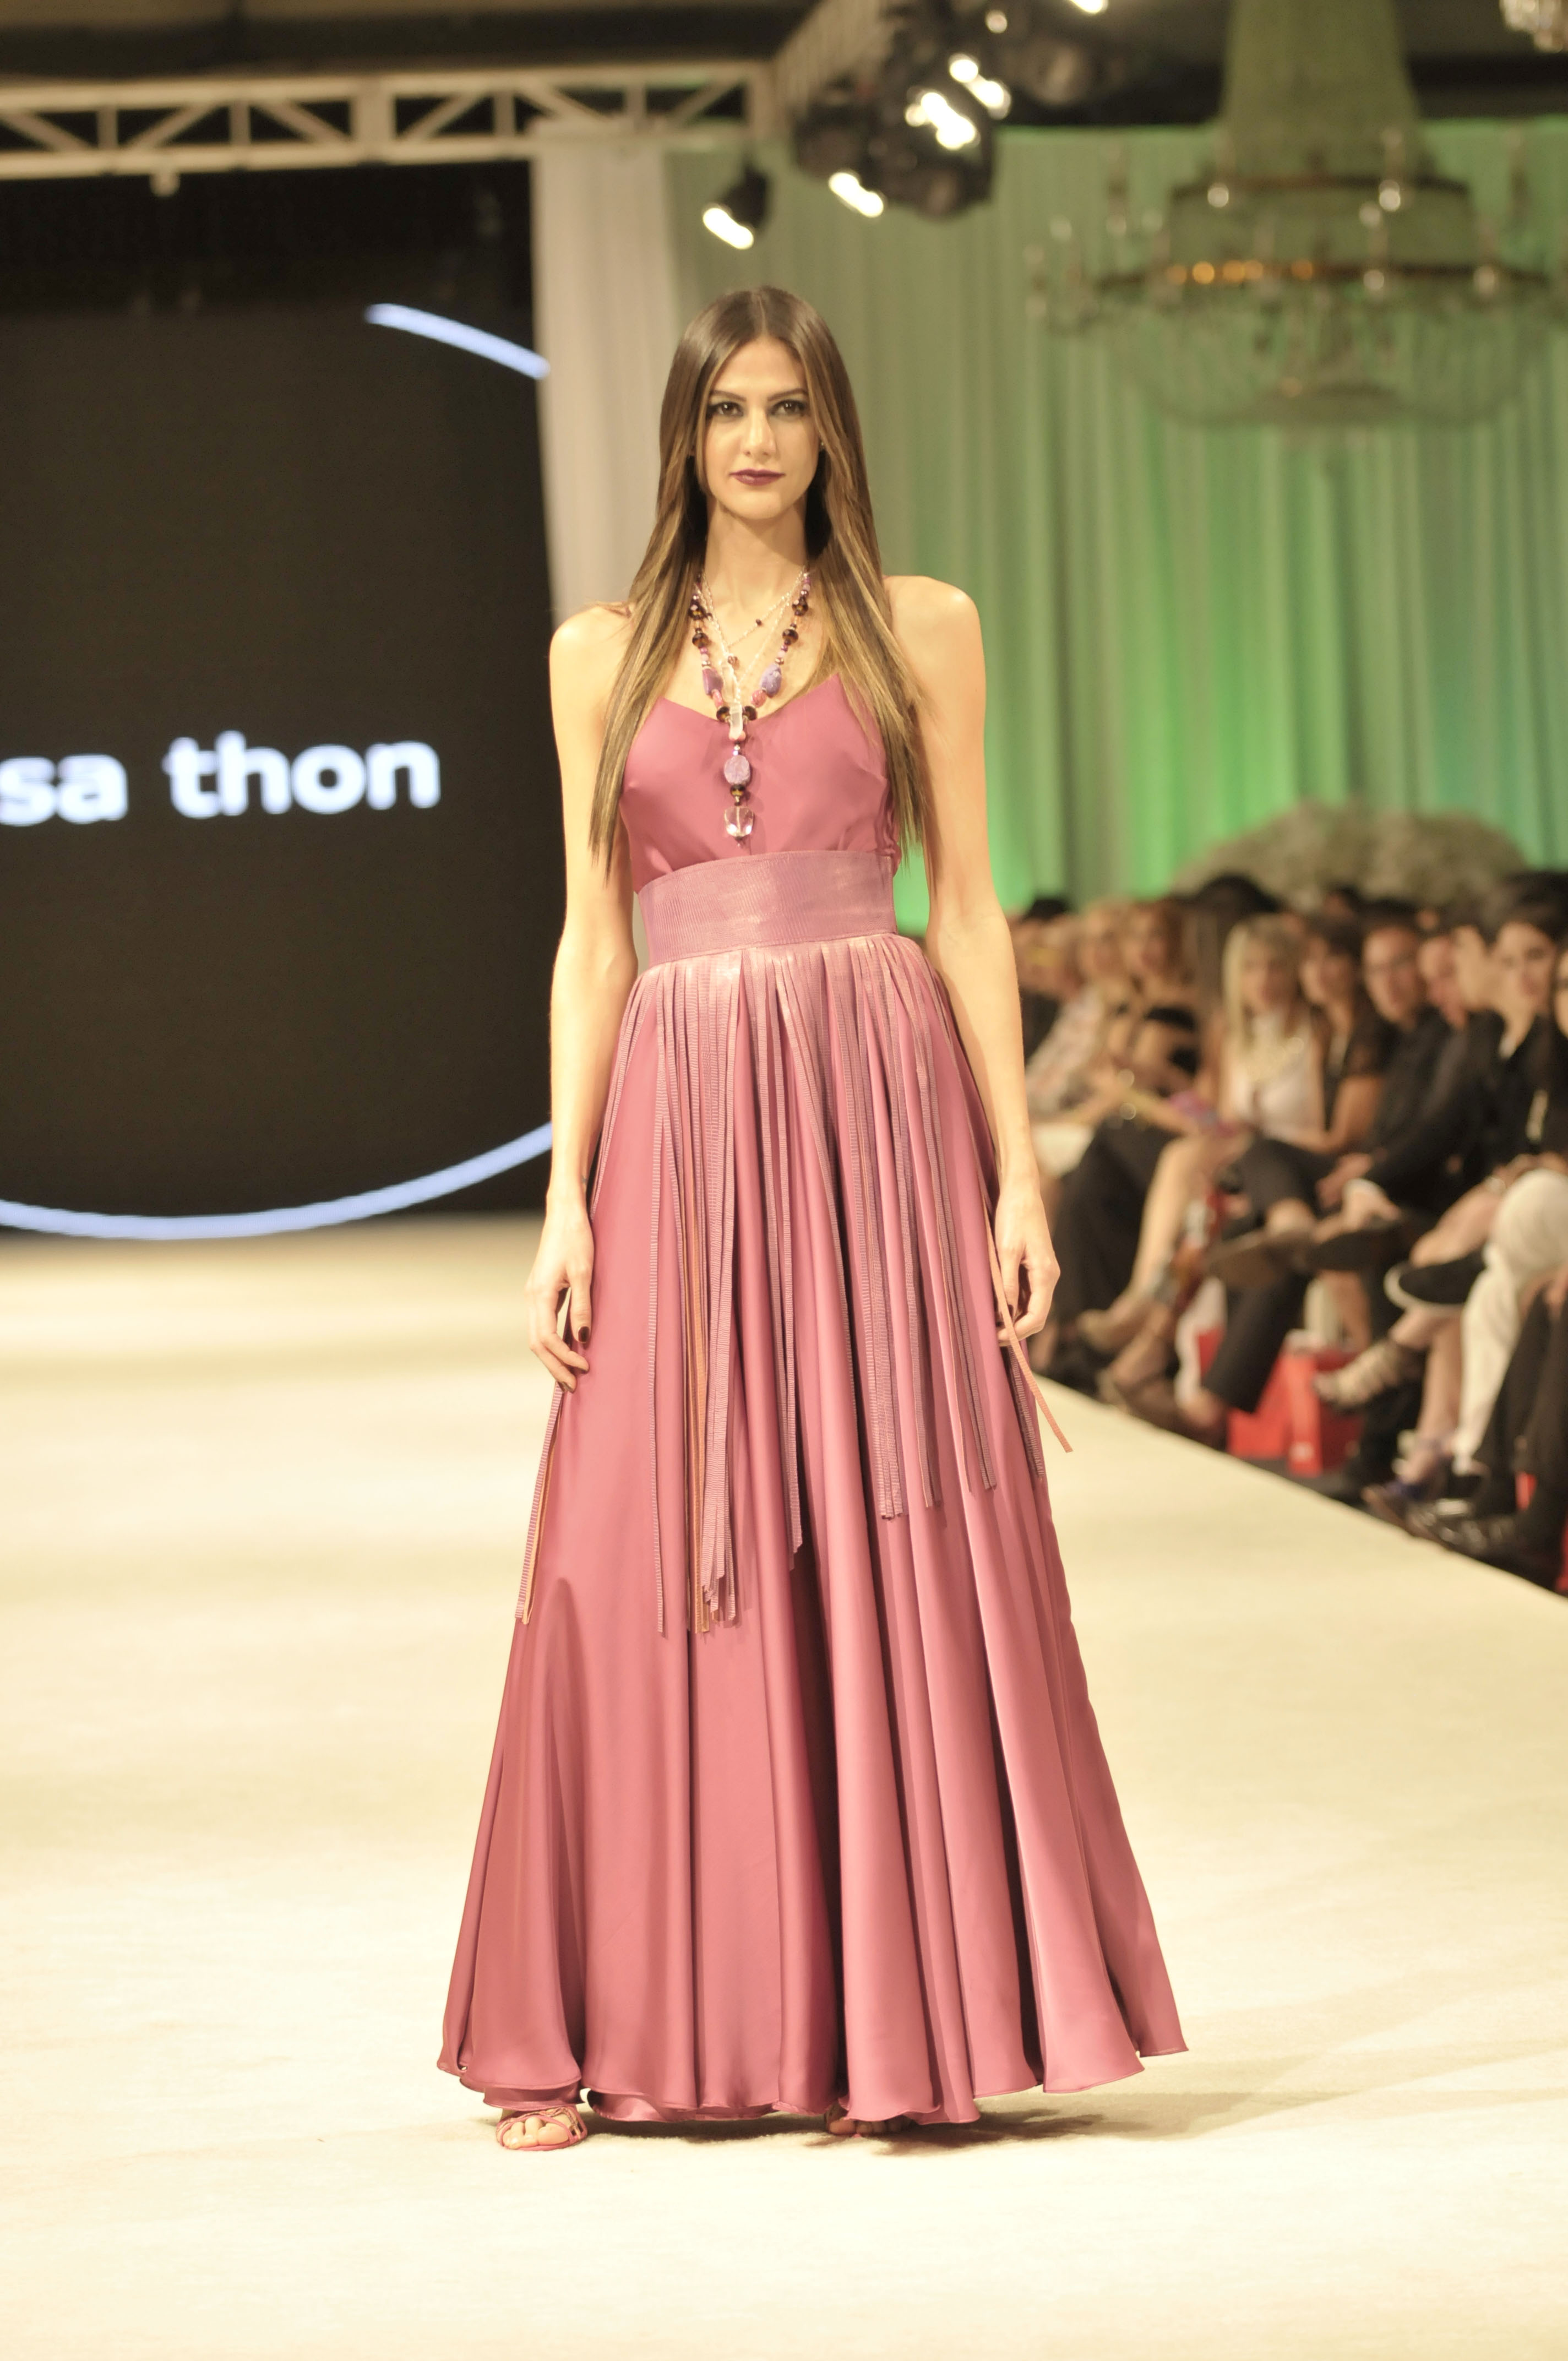 Lisa Thon